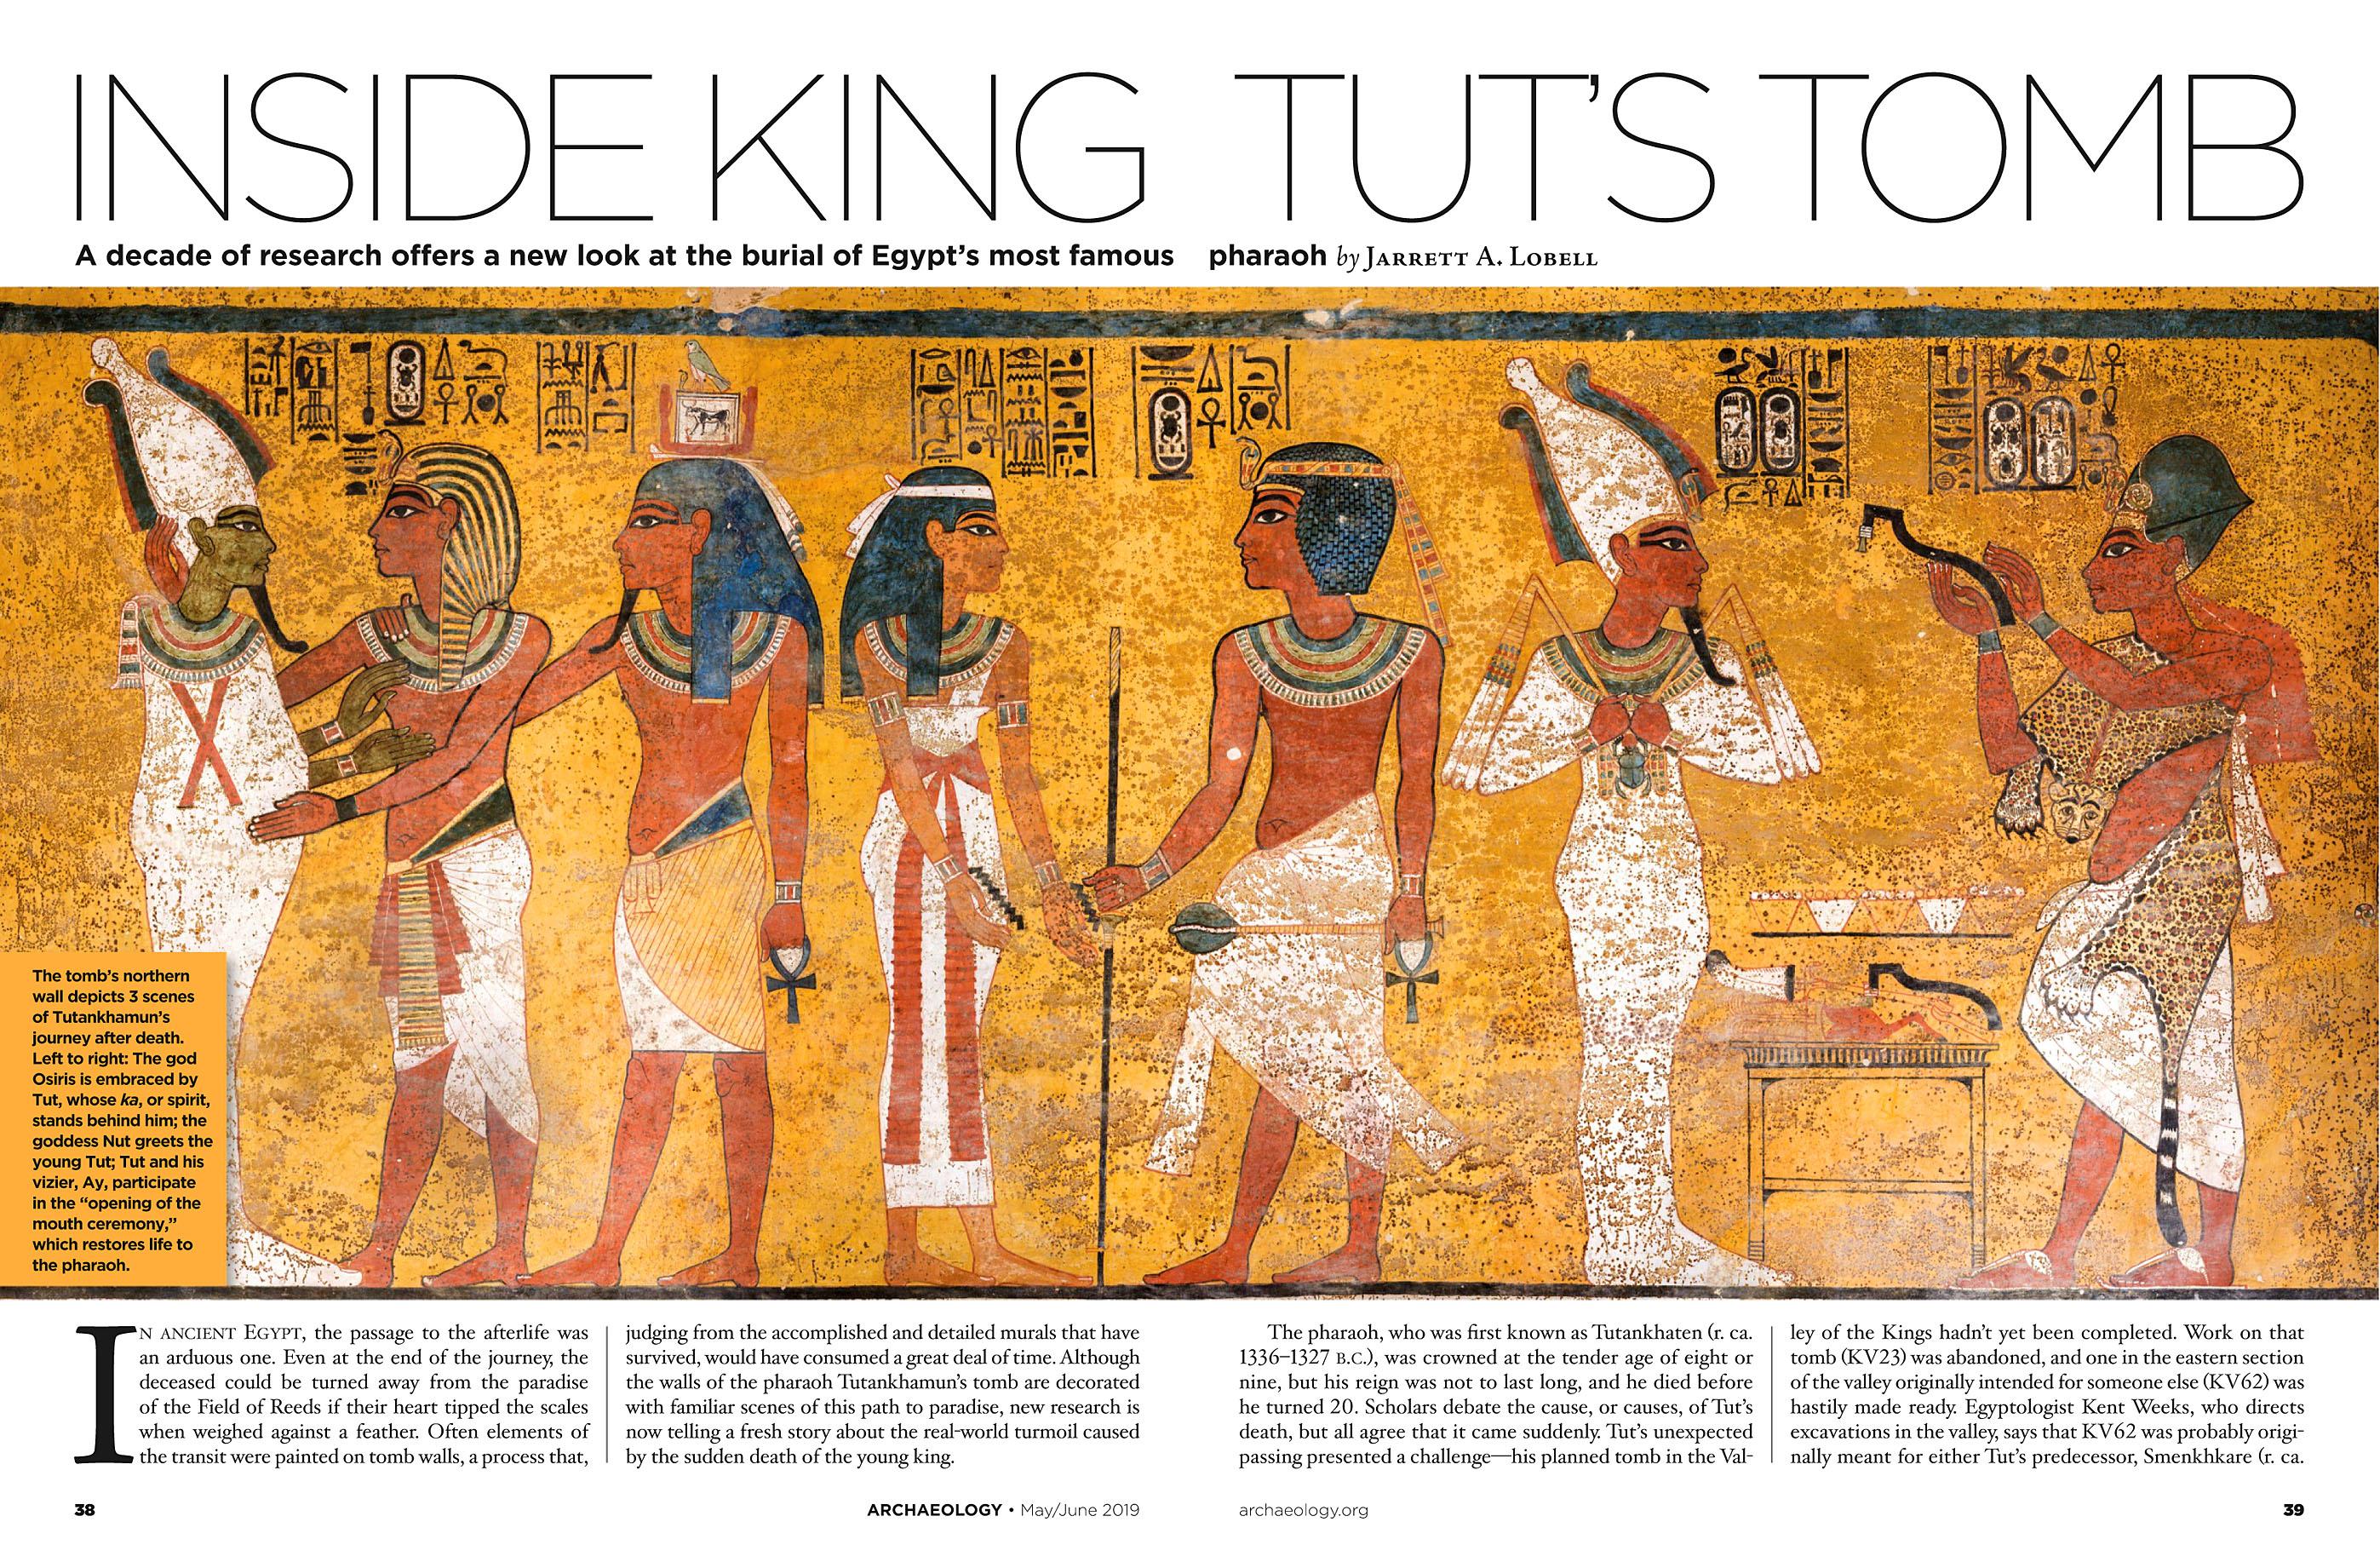 Archaeology 2019-05-06 Egypt2.jpg